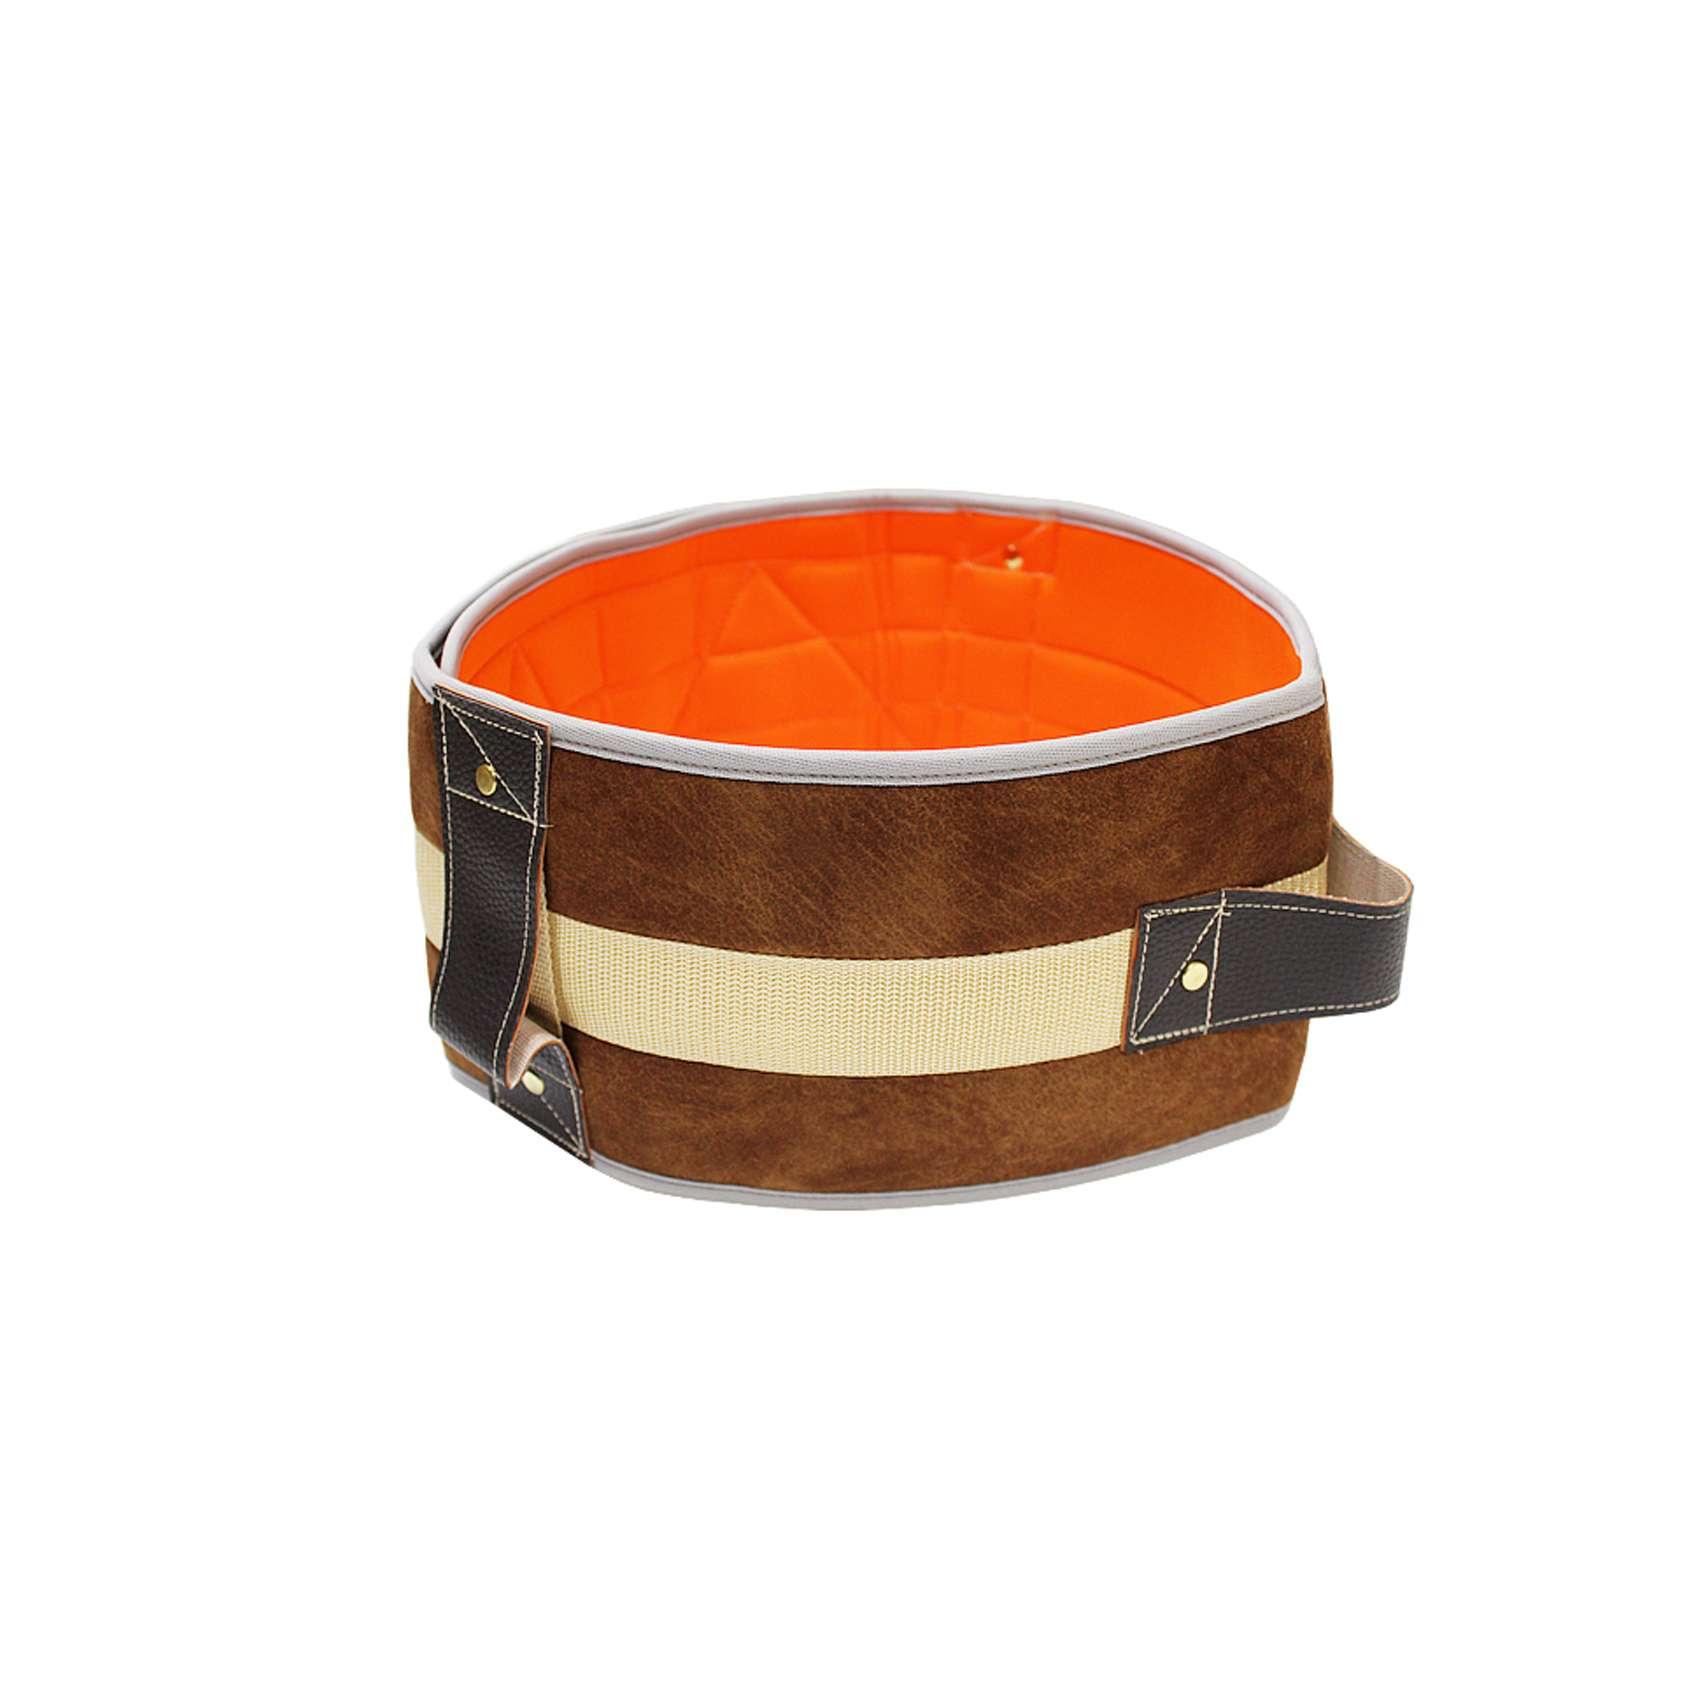 Patient Handling Transfer Gait Belt Walking Aid Waist Belt